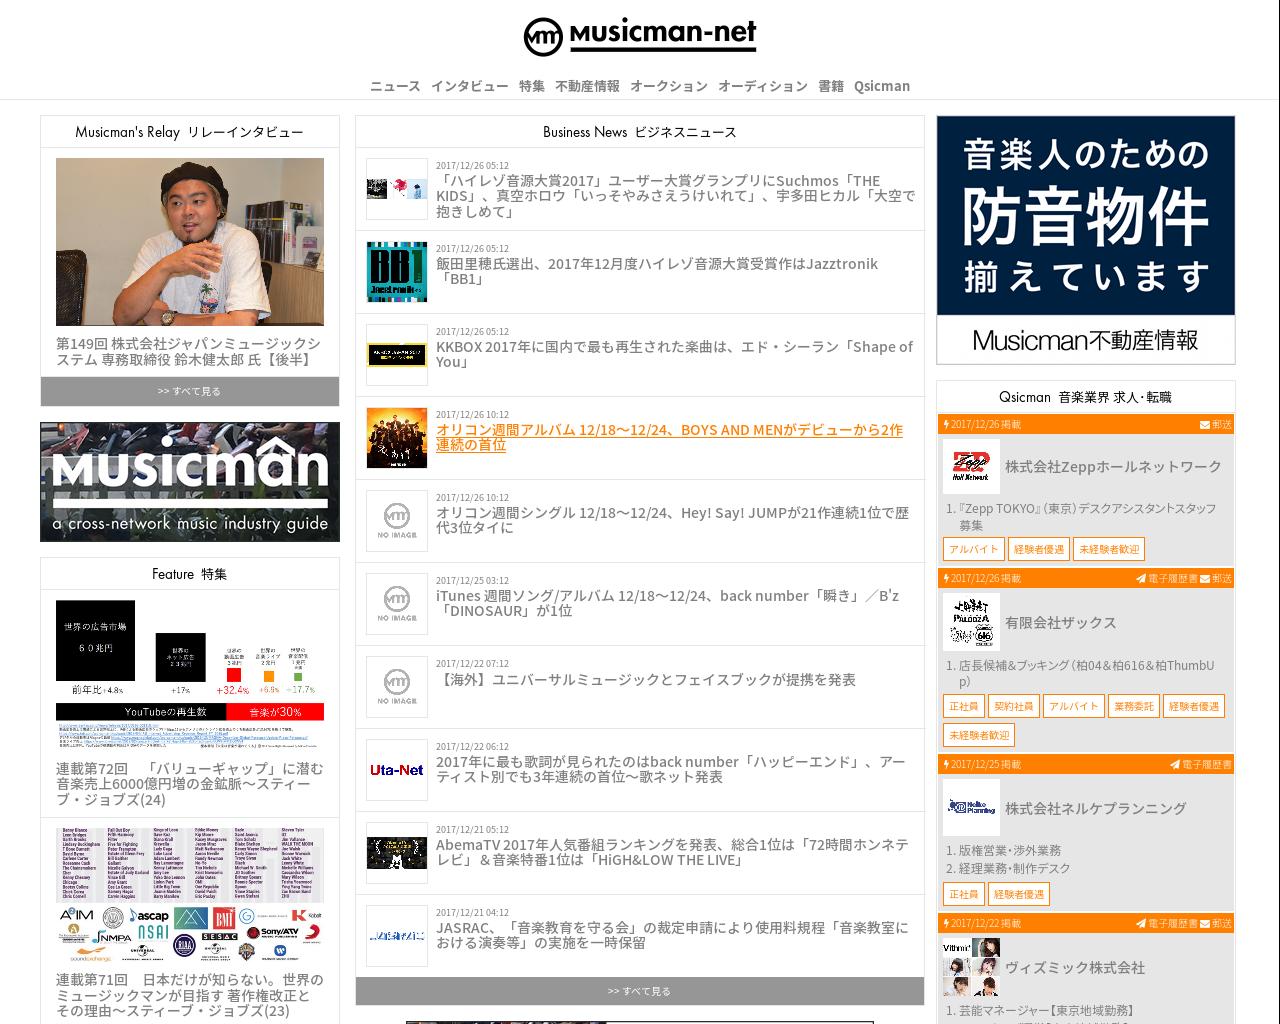 www.musicman-net.com(2017/12/27 08:50:40)